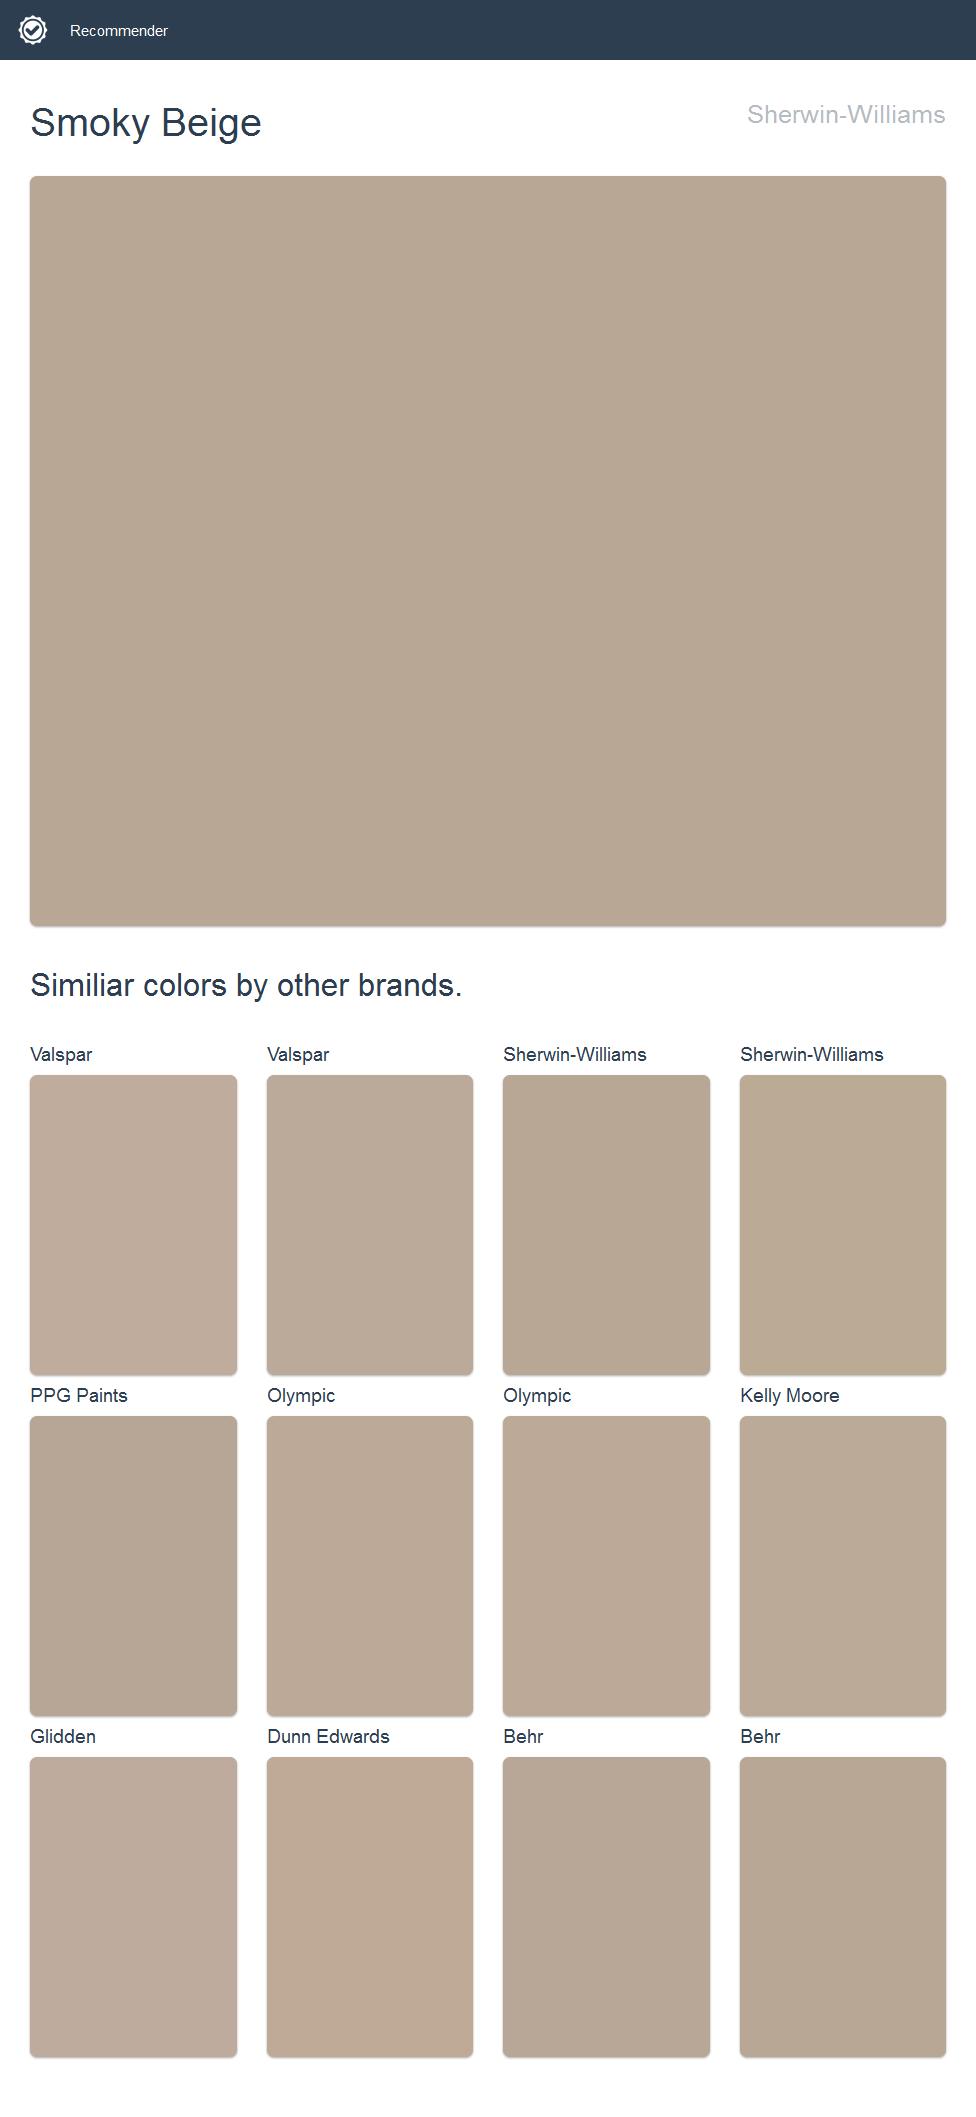 Glidden Smoky Charcoal smoky beige, sherwin-williams.   dunn edwards paint, dutch